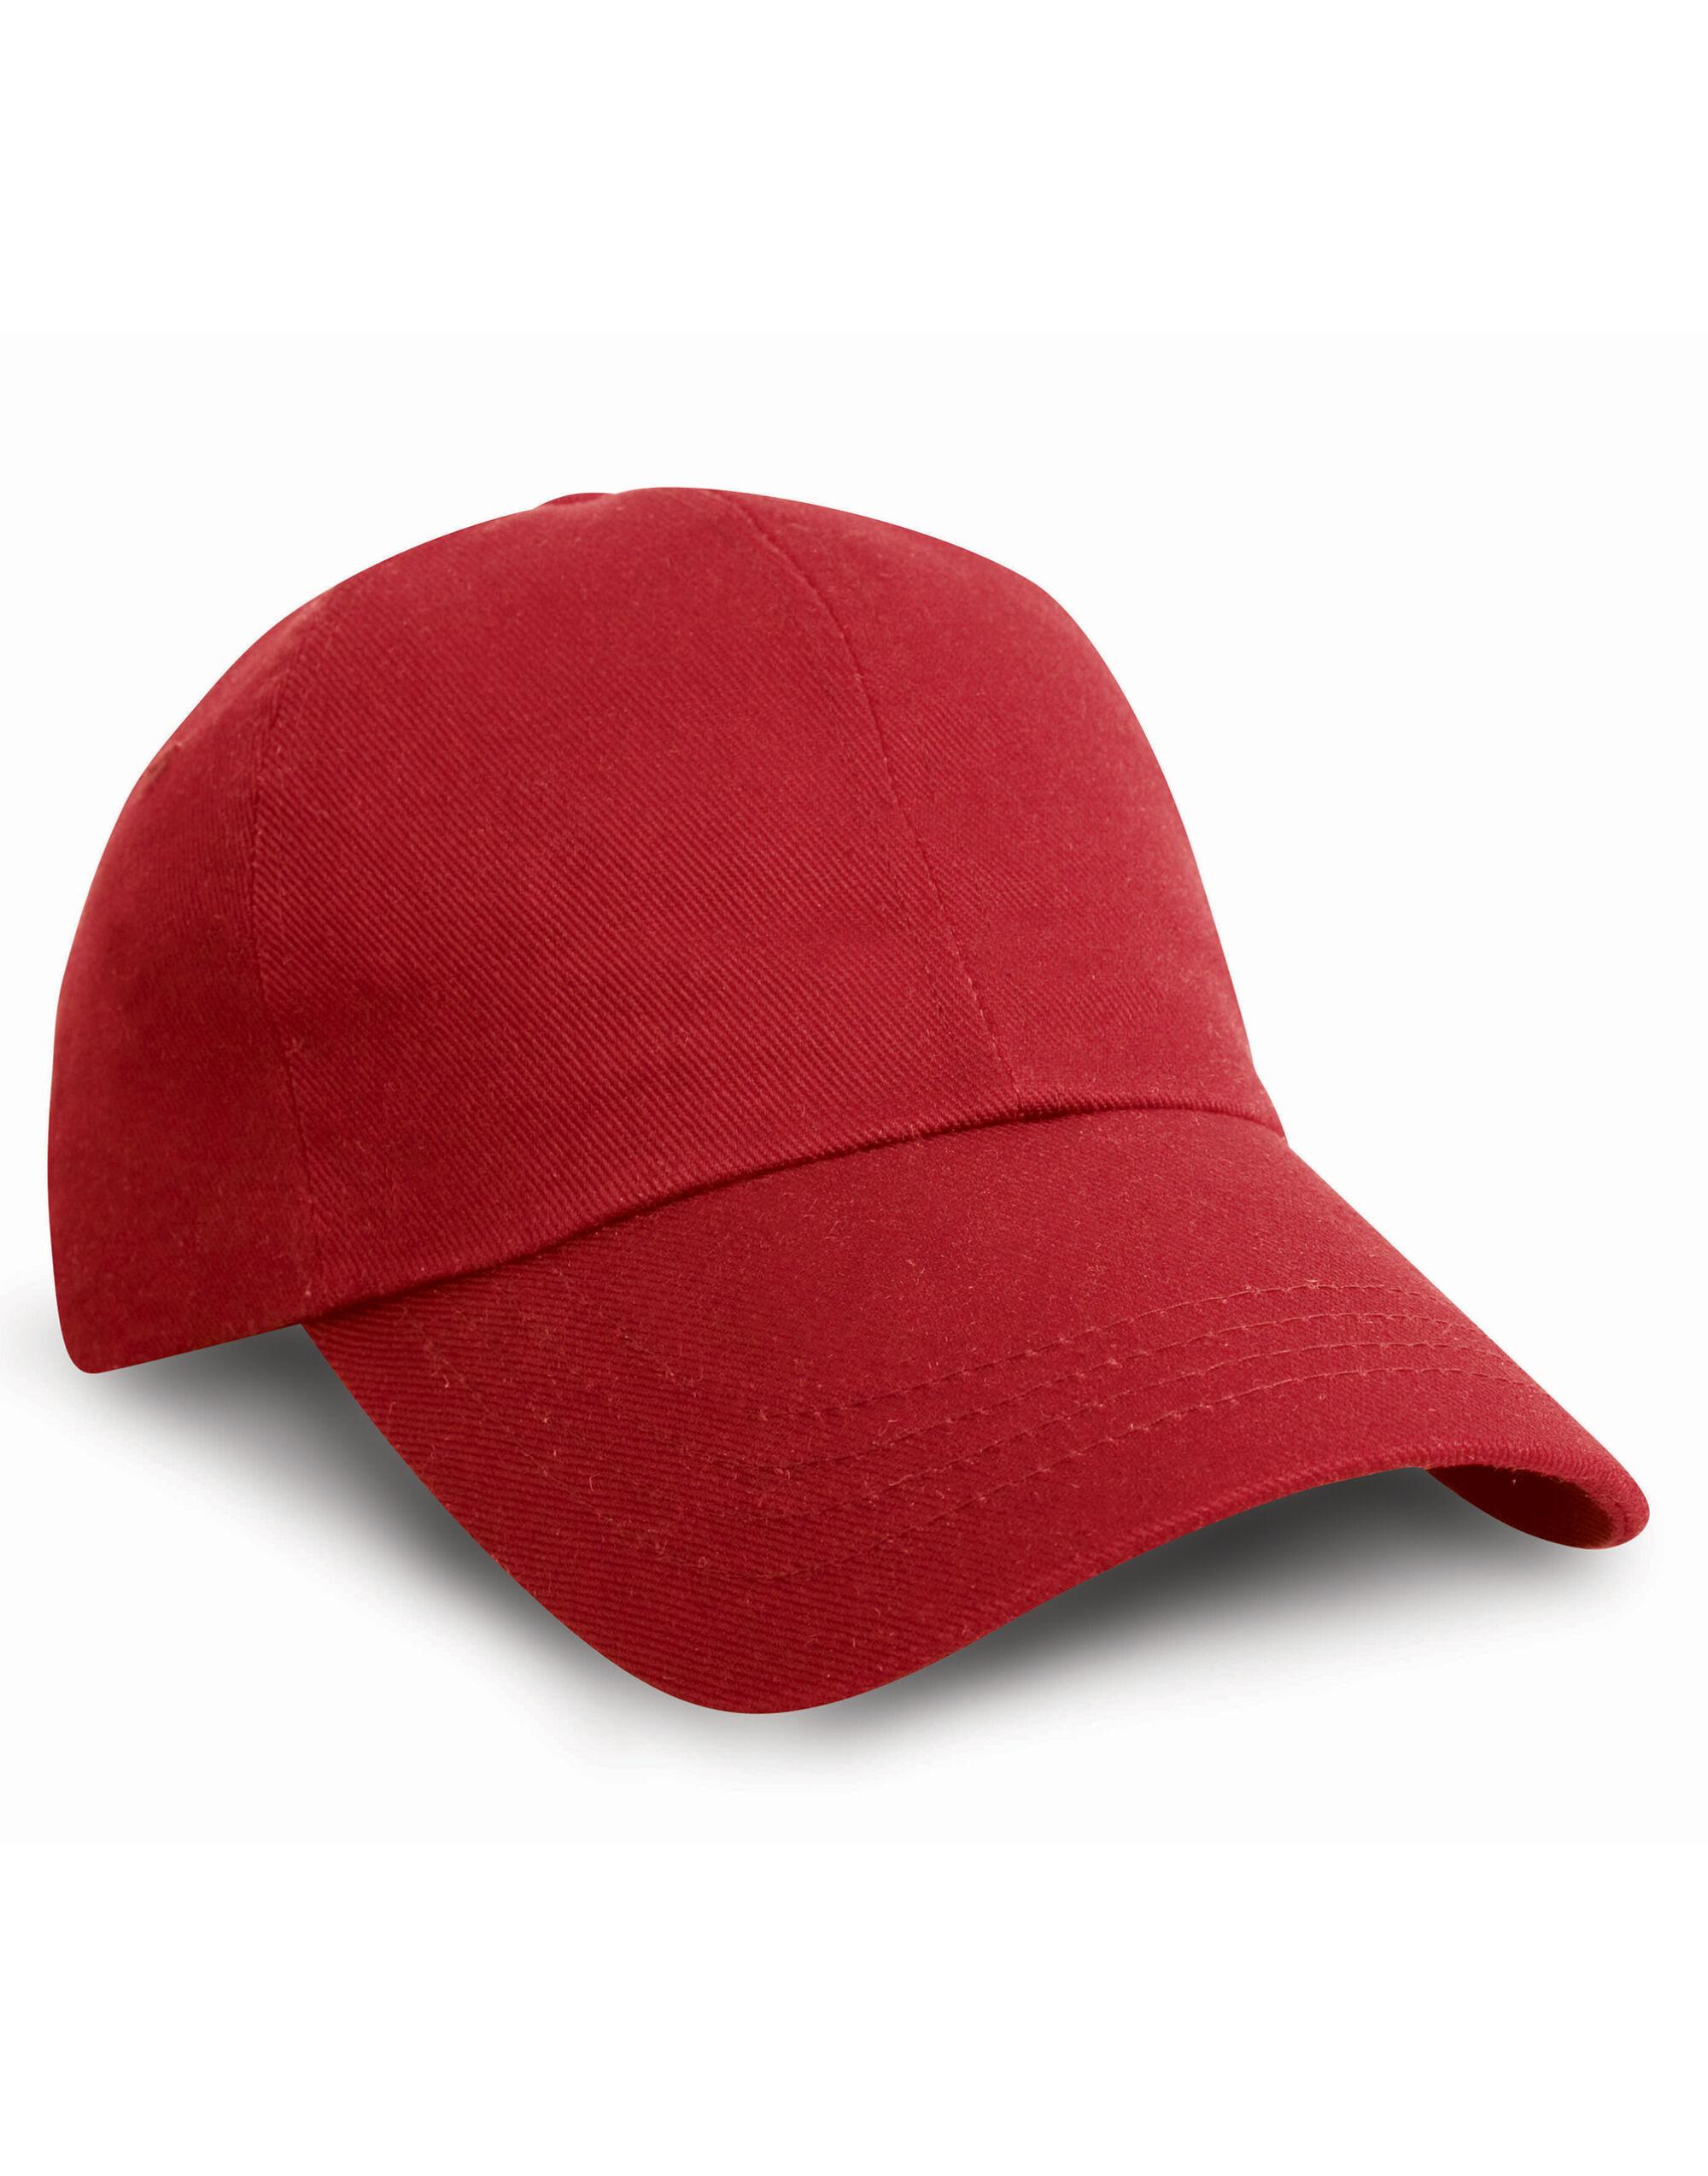 Heavy Cotton Pro-Style Cap